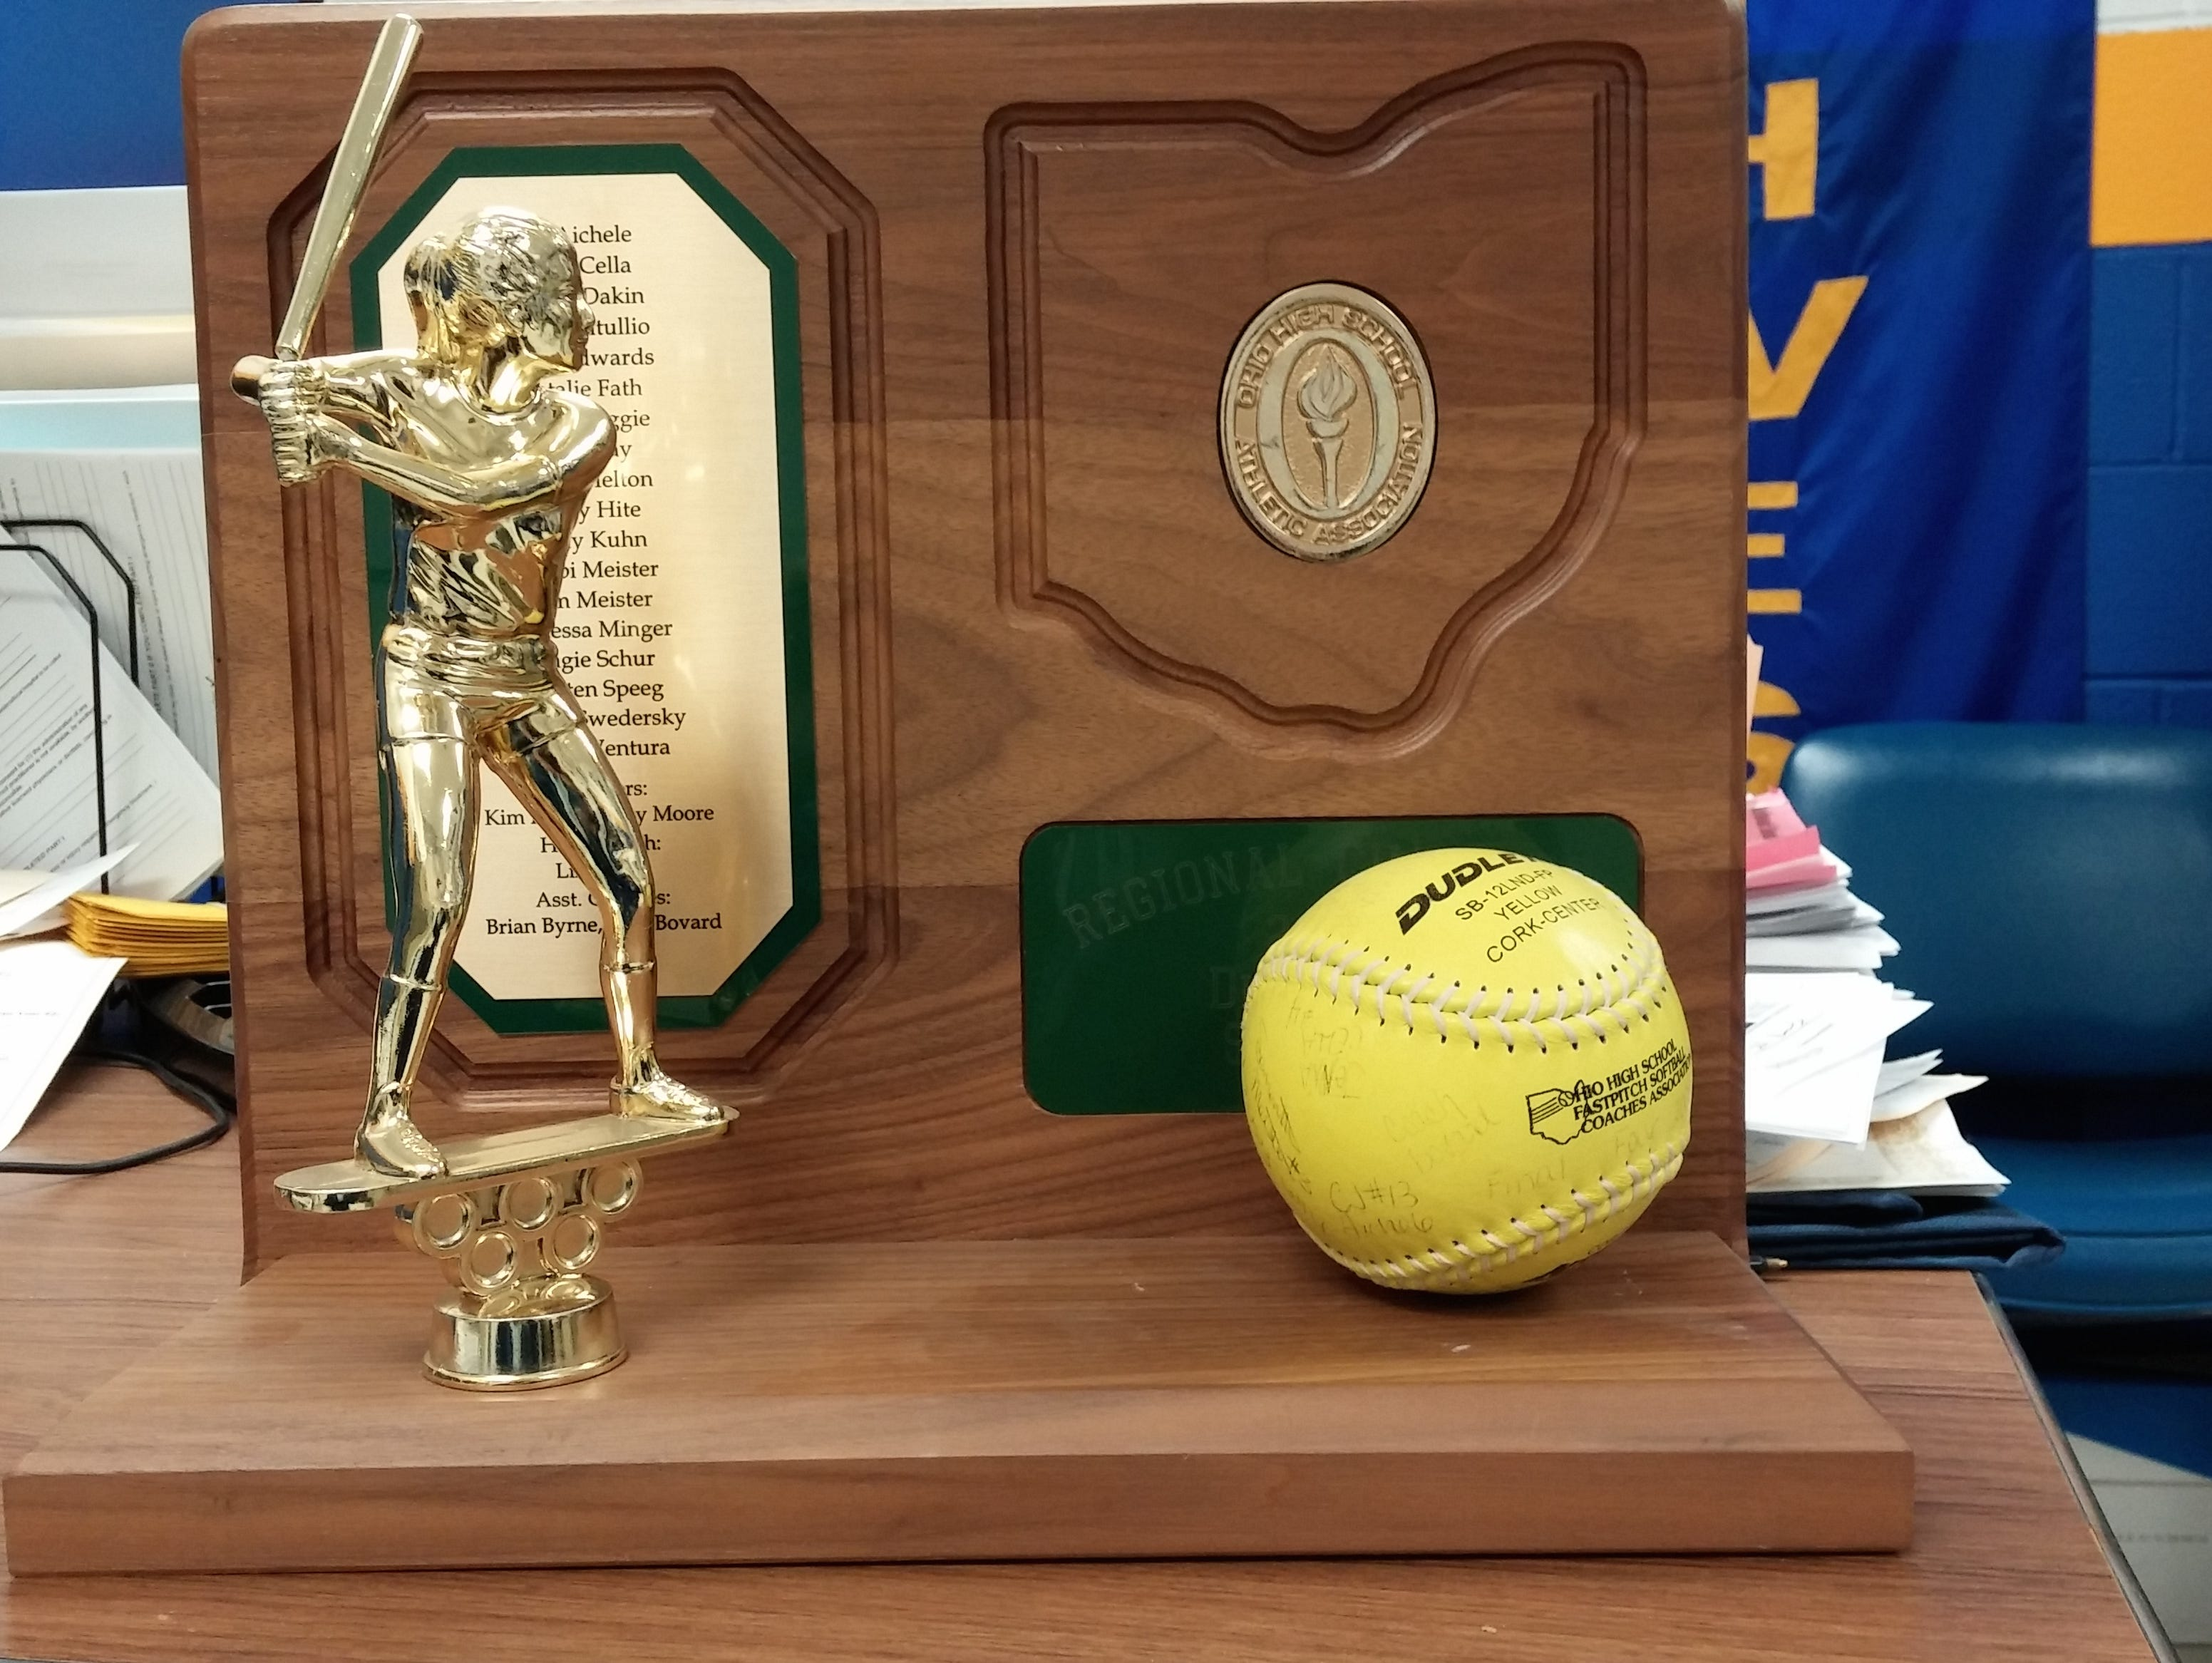 The 2000 Southwest District softball regional championship trophy (note the broken bat).